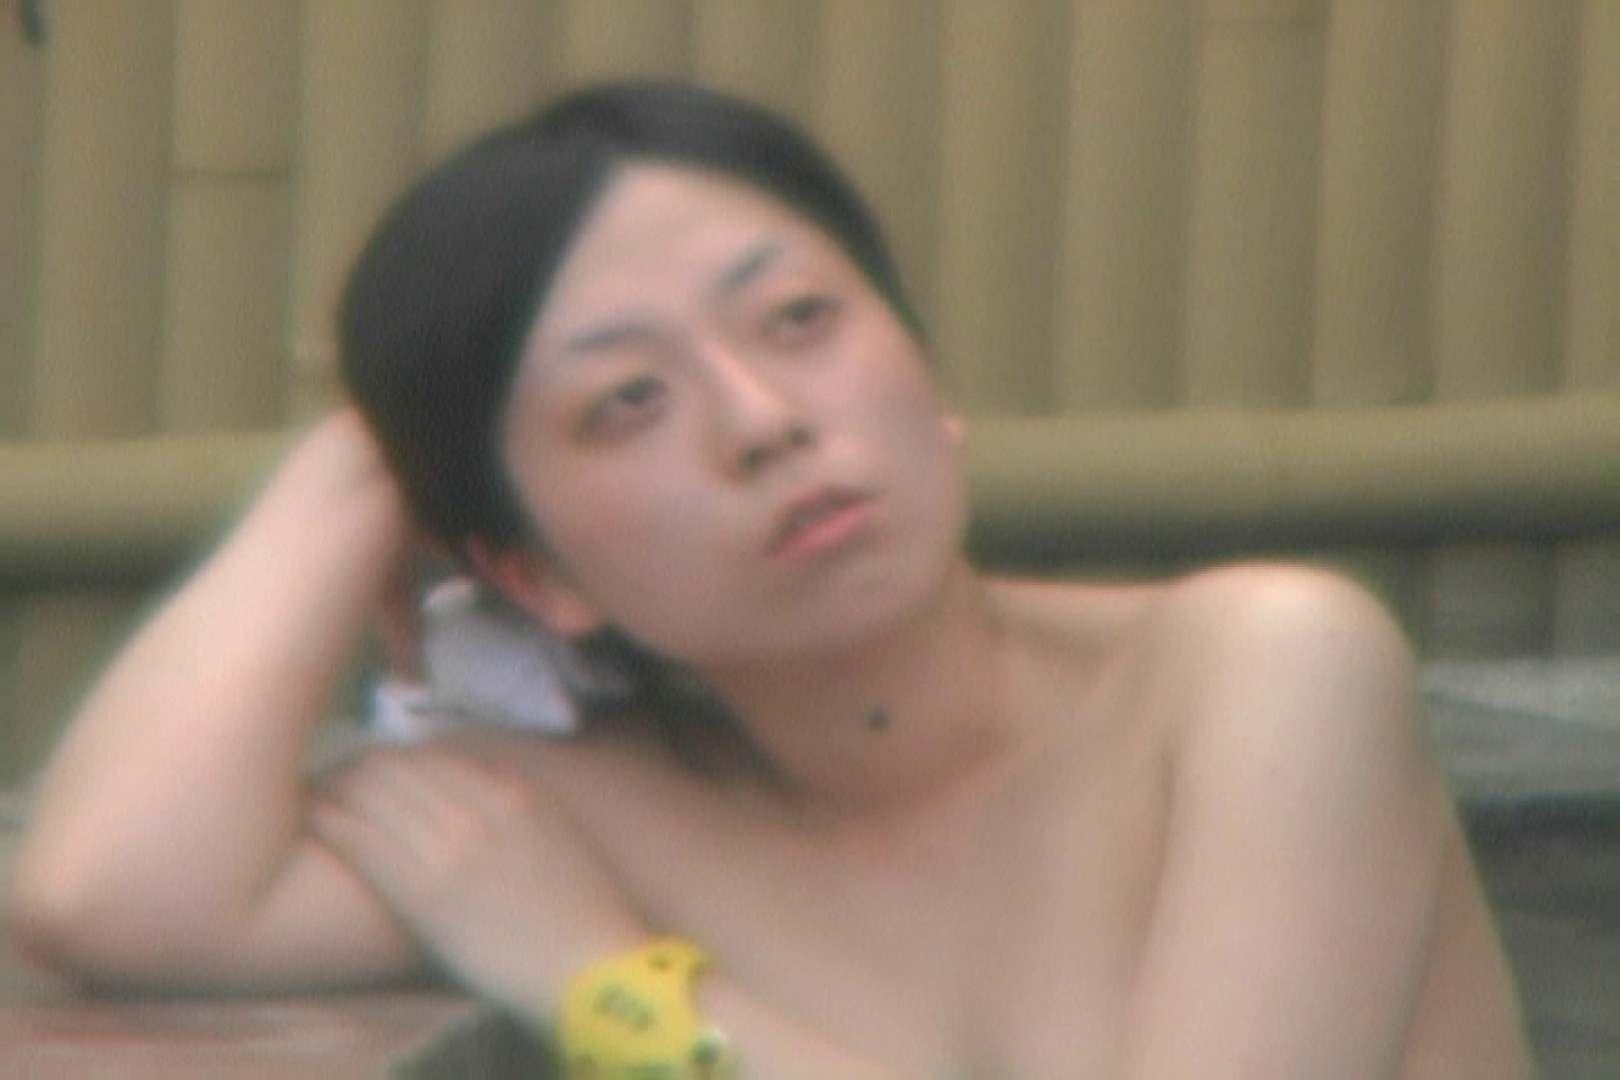 Aquaな露天風呂Vol.562 OLセックス | 盗撮  109画像 16